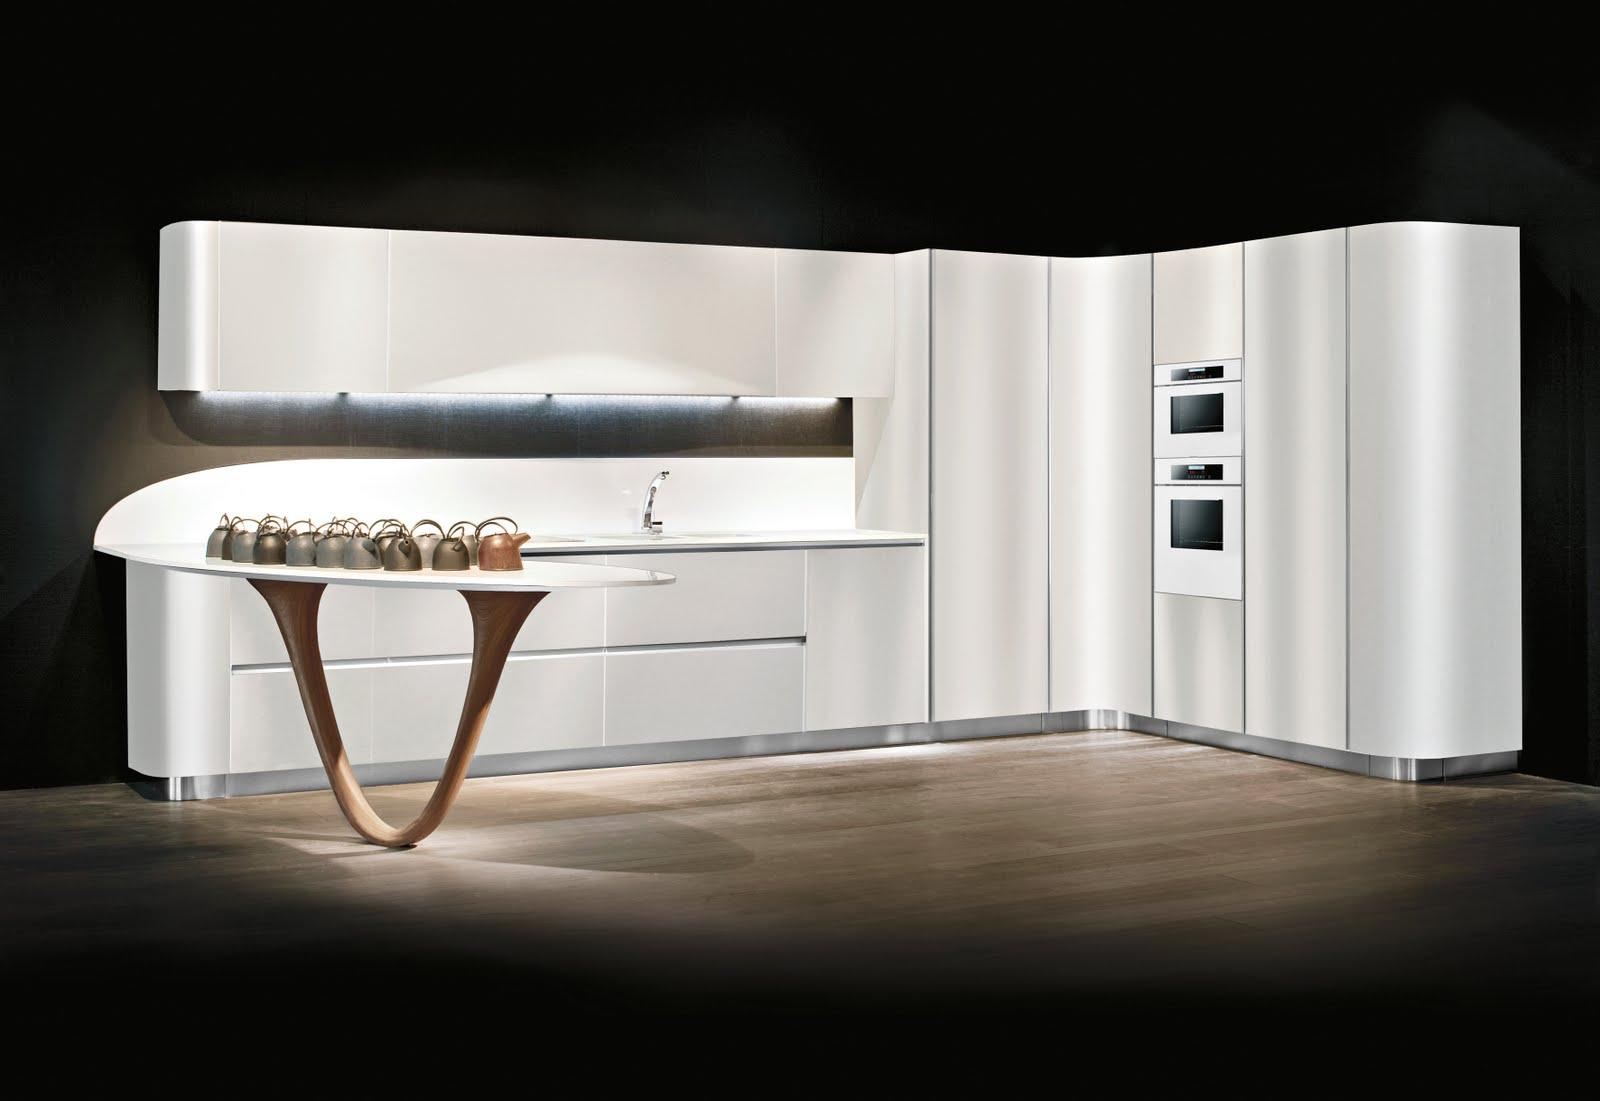 Emejing Cucina Snaidero Ola 20 Prezzo Gallery - Embercreative.us ...